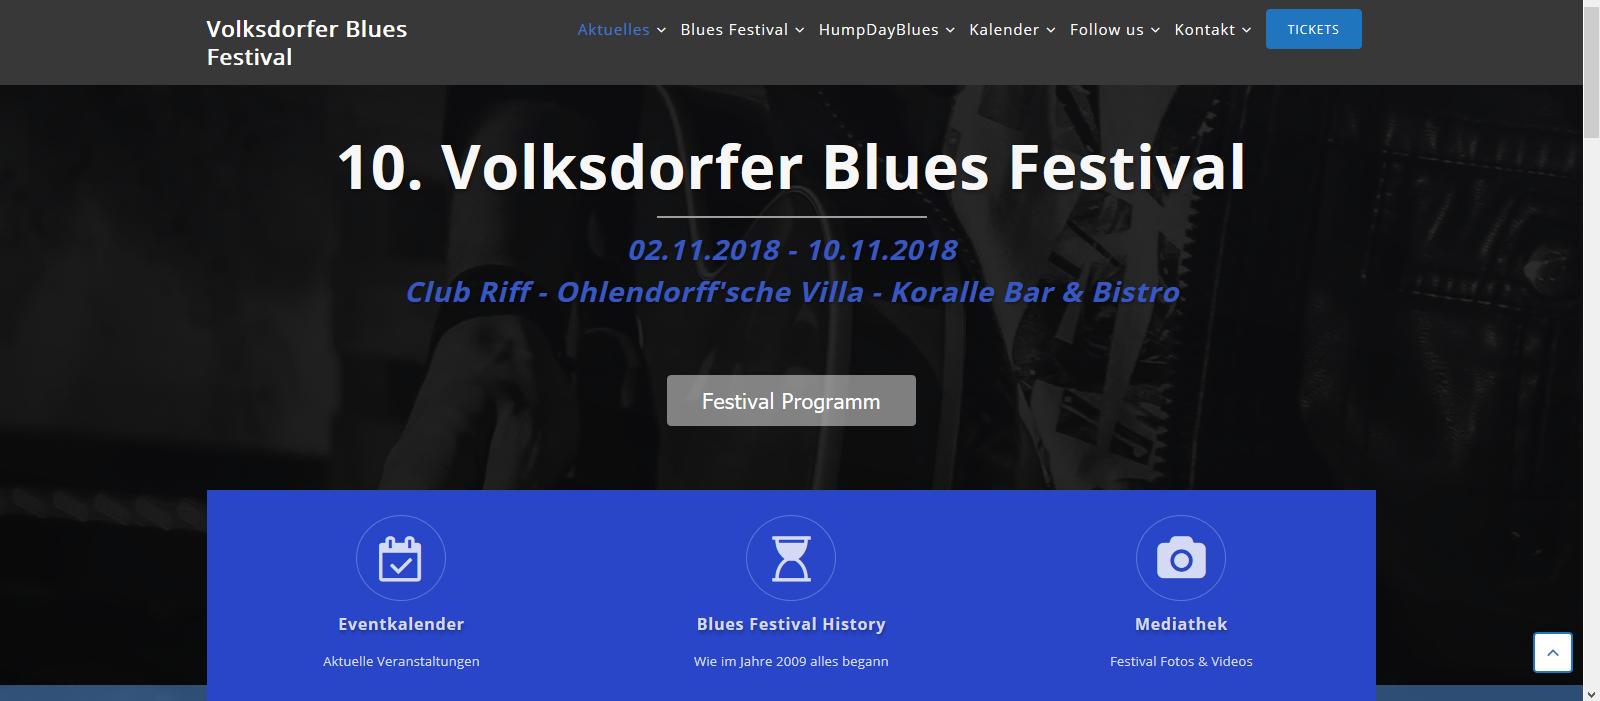 Die neue Homepage vom Volksdorfer Blues Festival